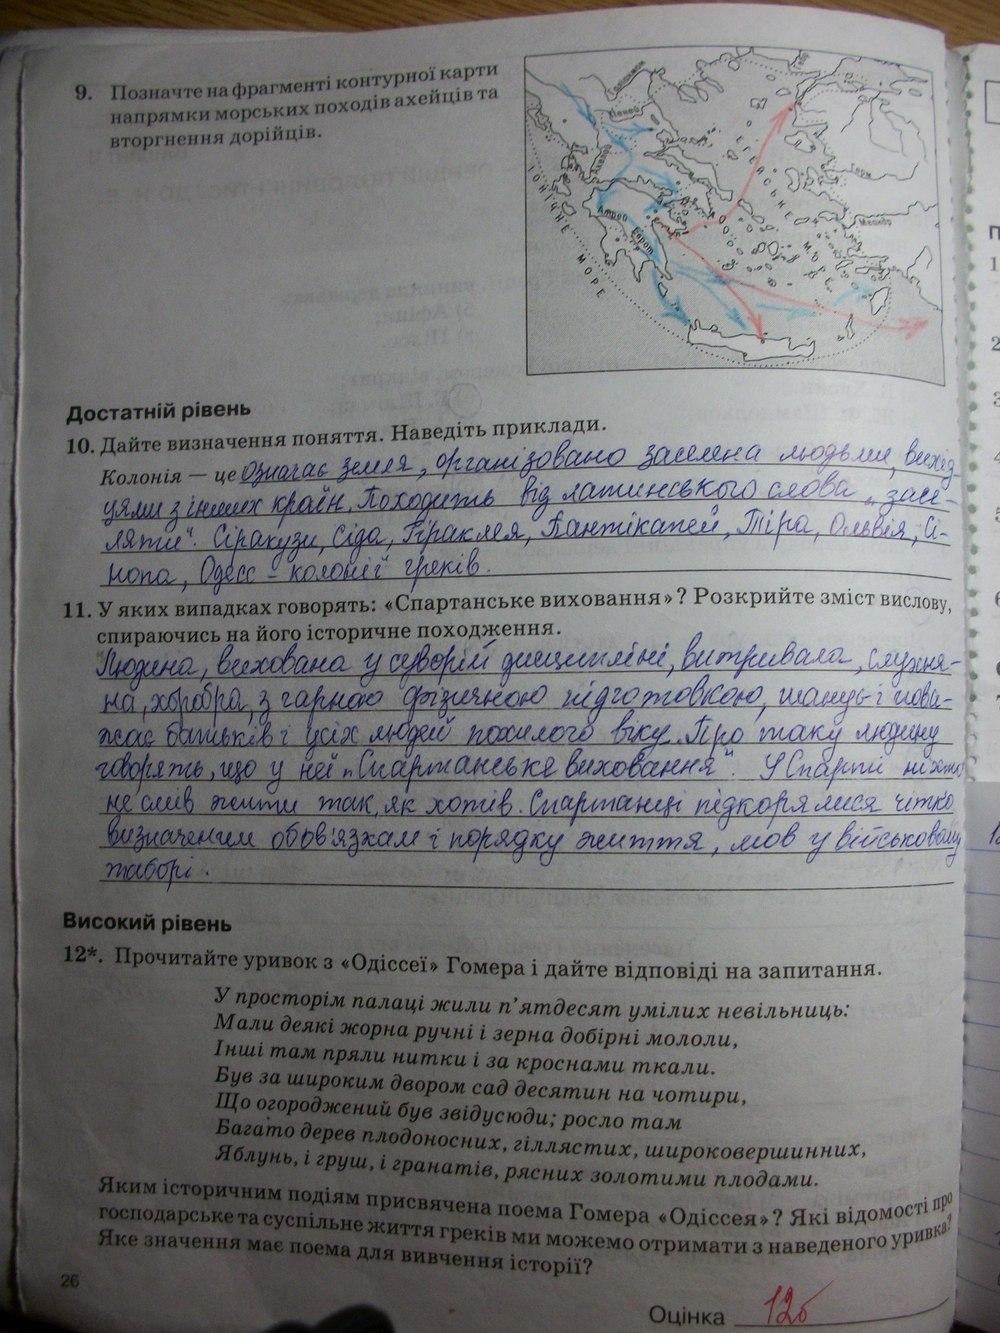 ГДЗ рабочие тетради 6 класс. Задание: стр. 26